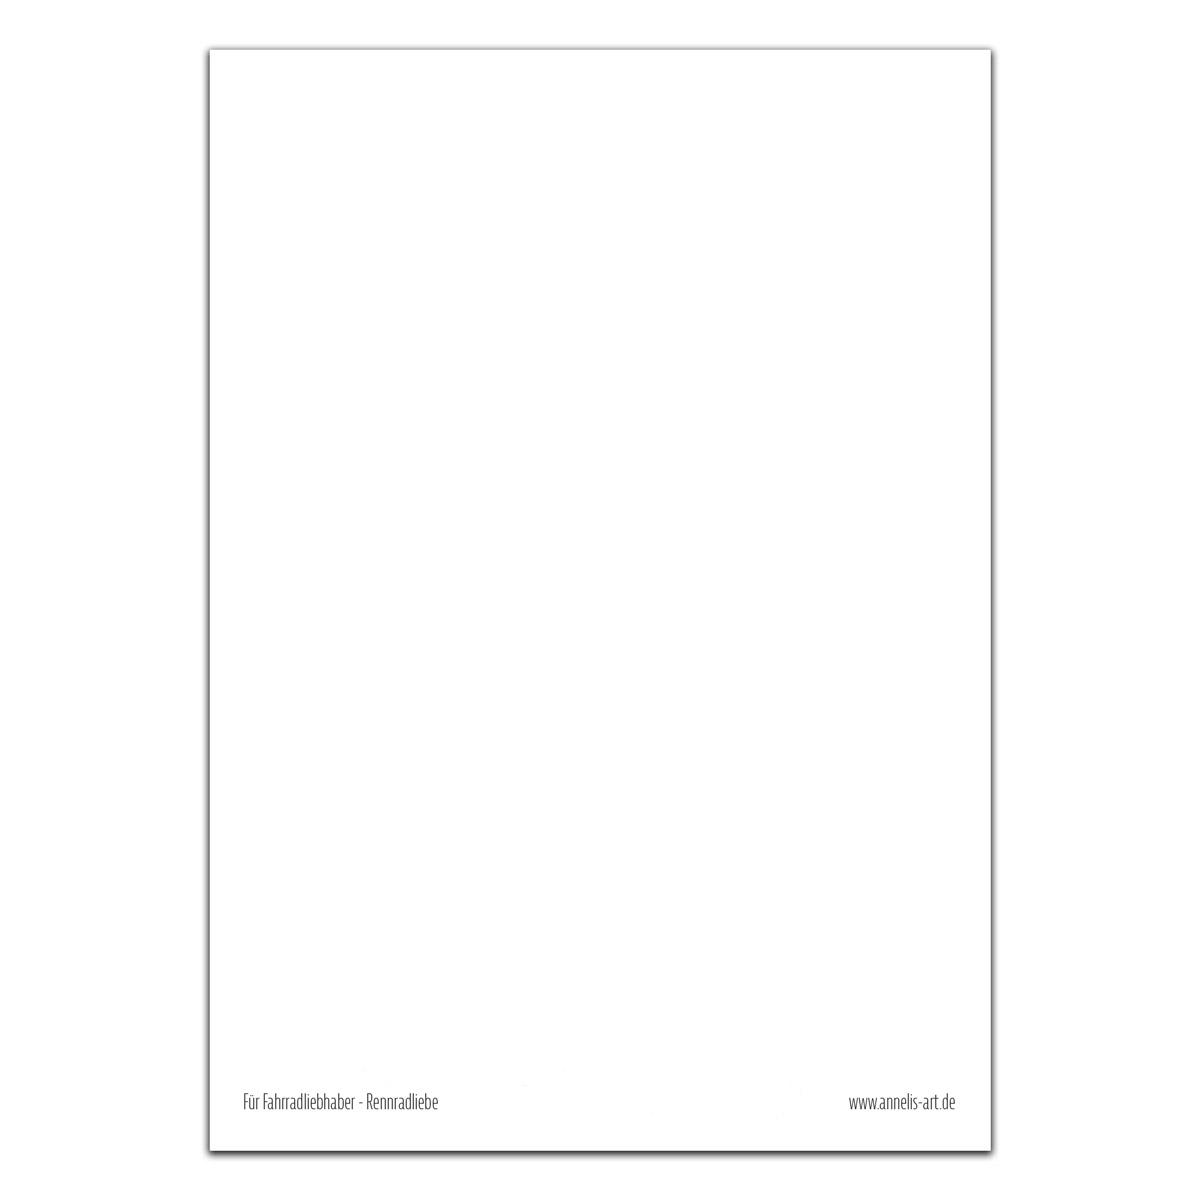 Postkarte | Rennradliebe